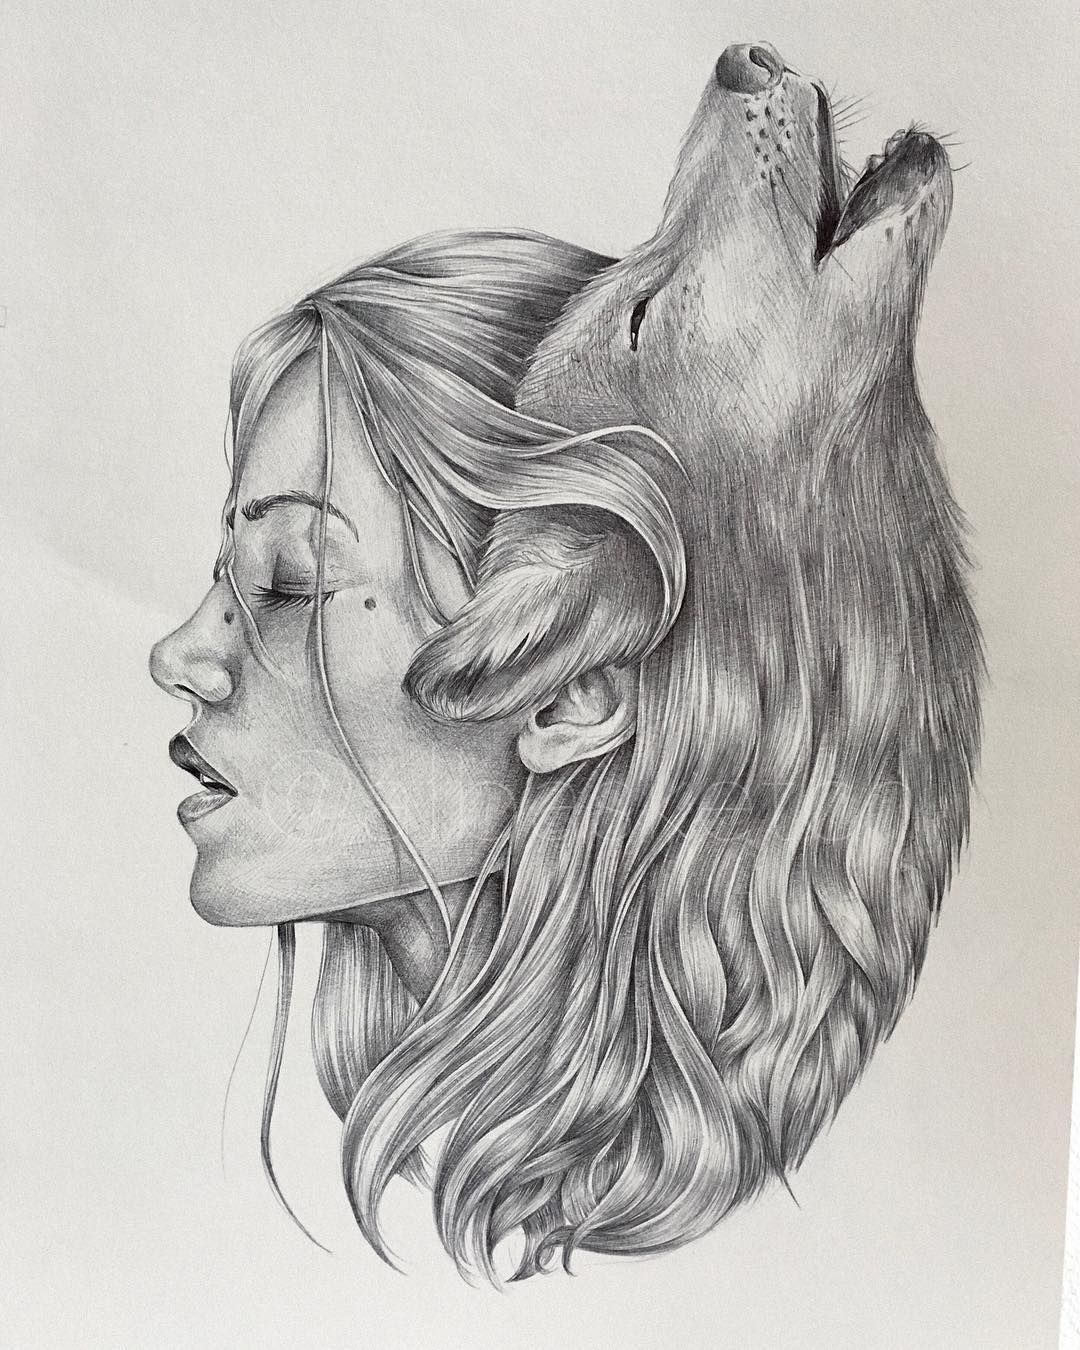 The Wolf Is My Spirit Animal